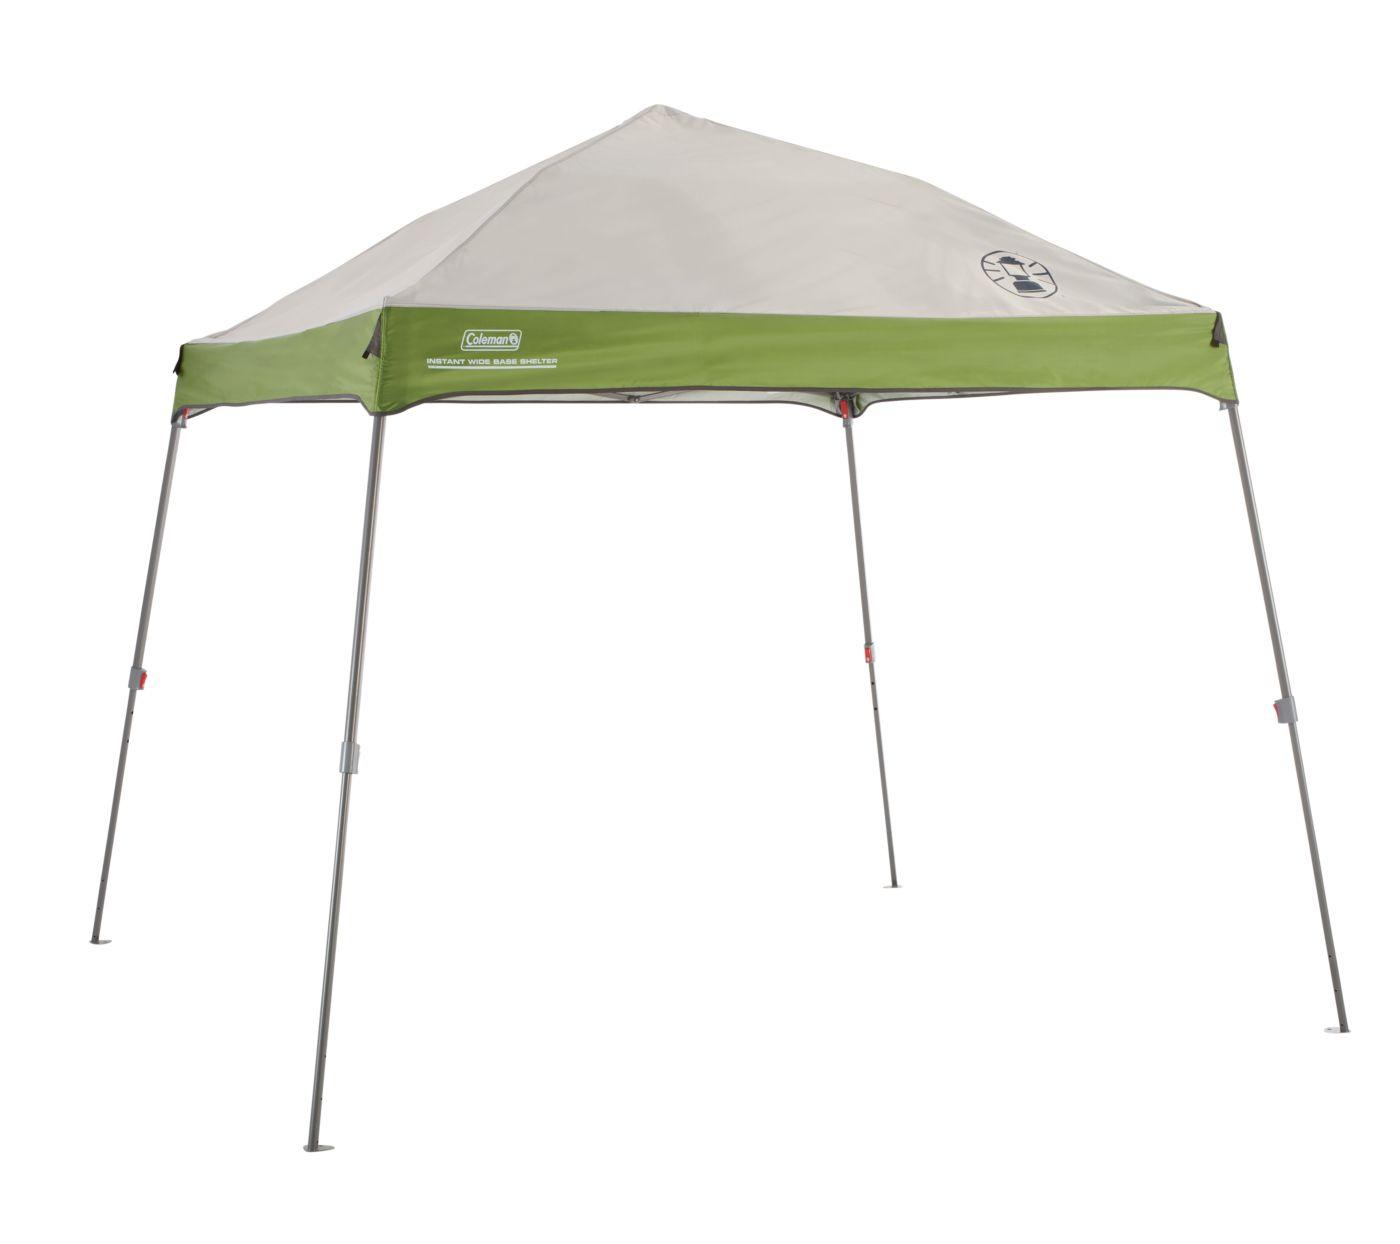 Shelter Repair Canopy Slant 10 X 10  sc 1 st  Coleman & Shelter Repair Canopy Slant 10 X 10 - USA